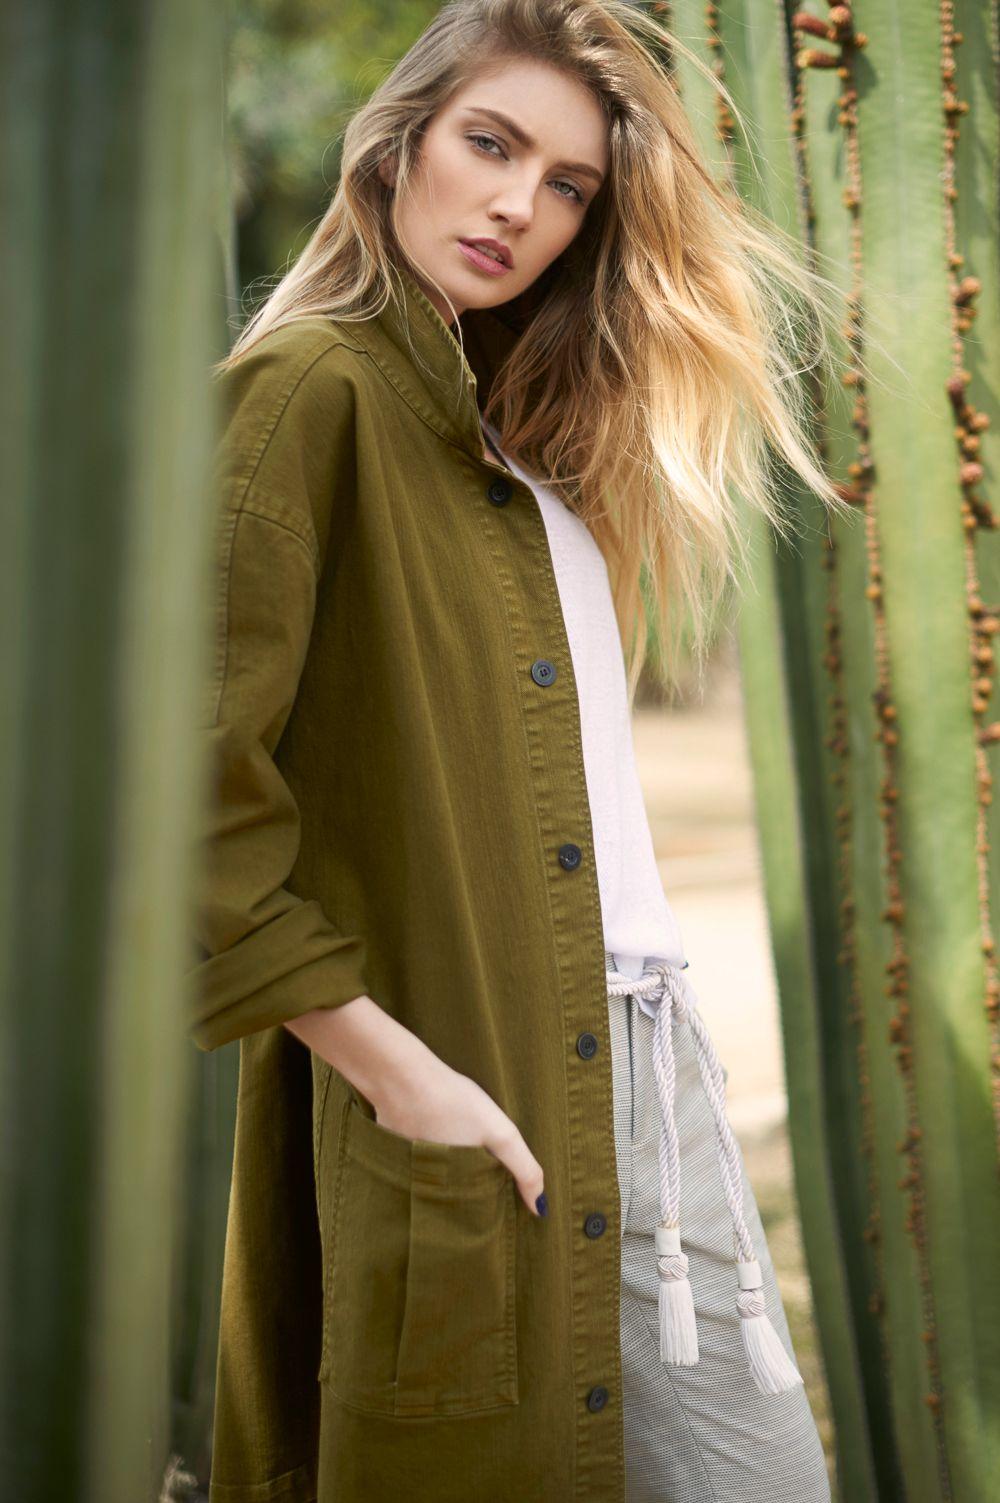 Chanel gray wilhelmina models - 2019 year